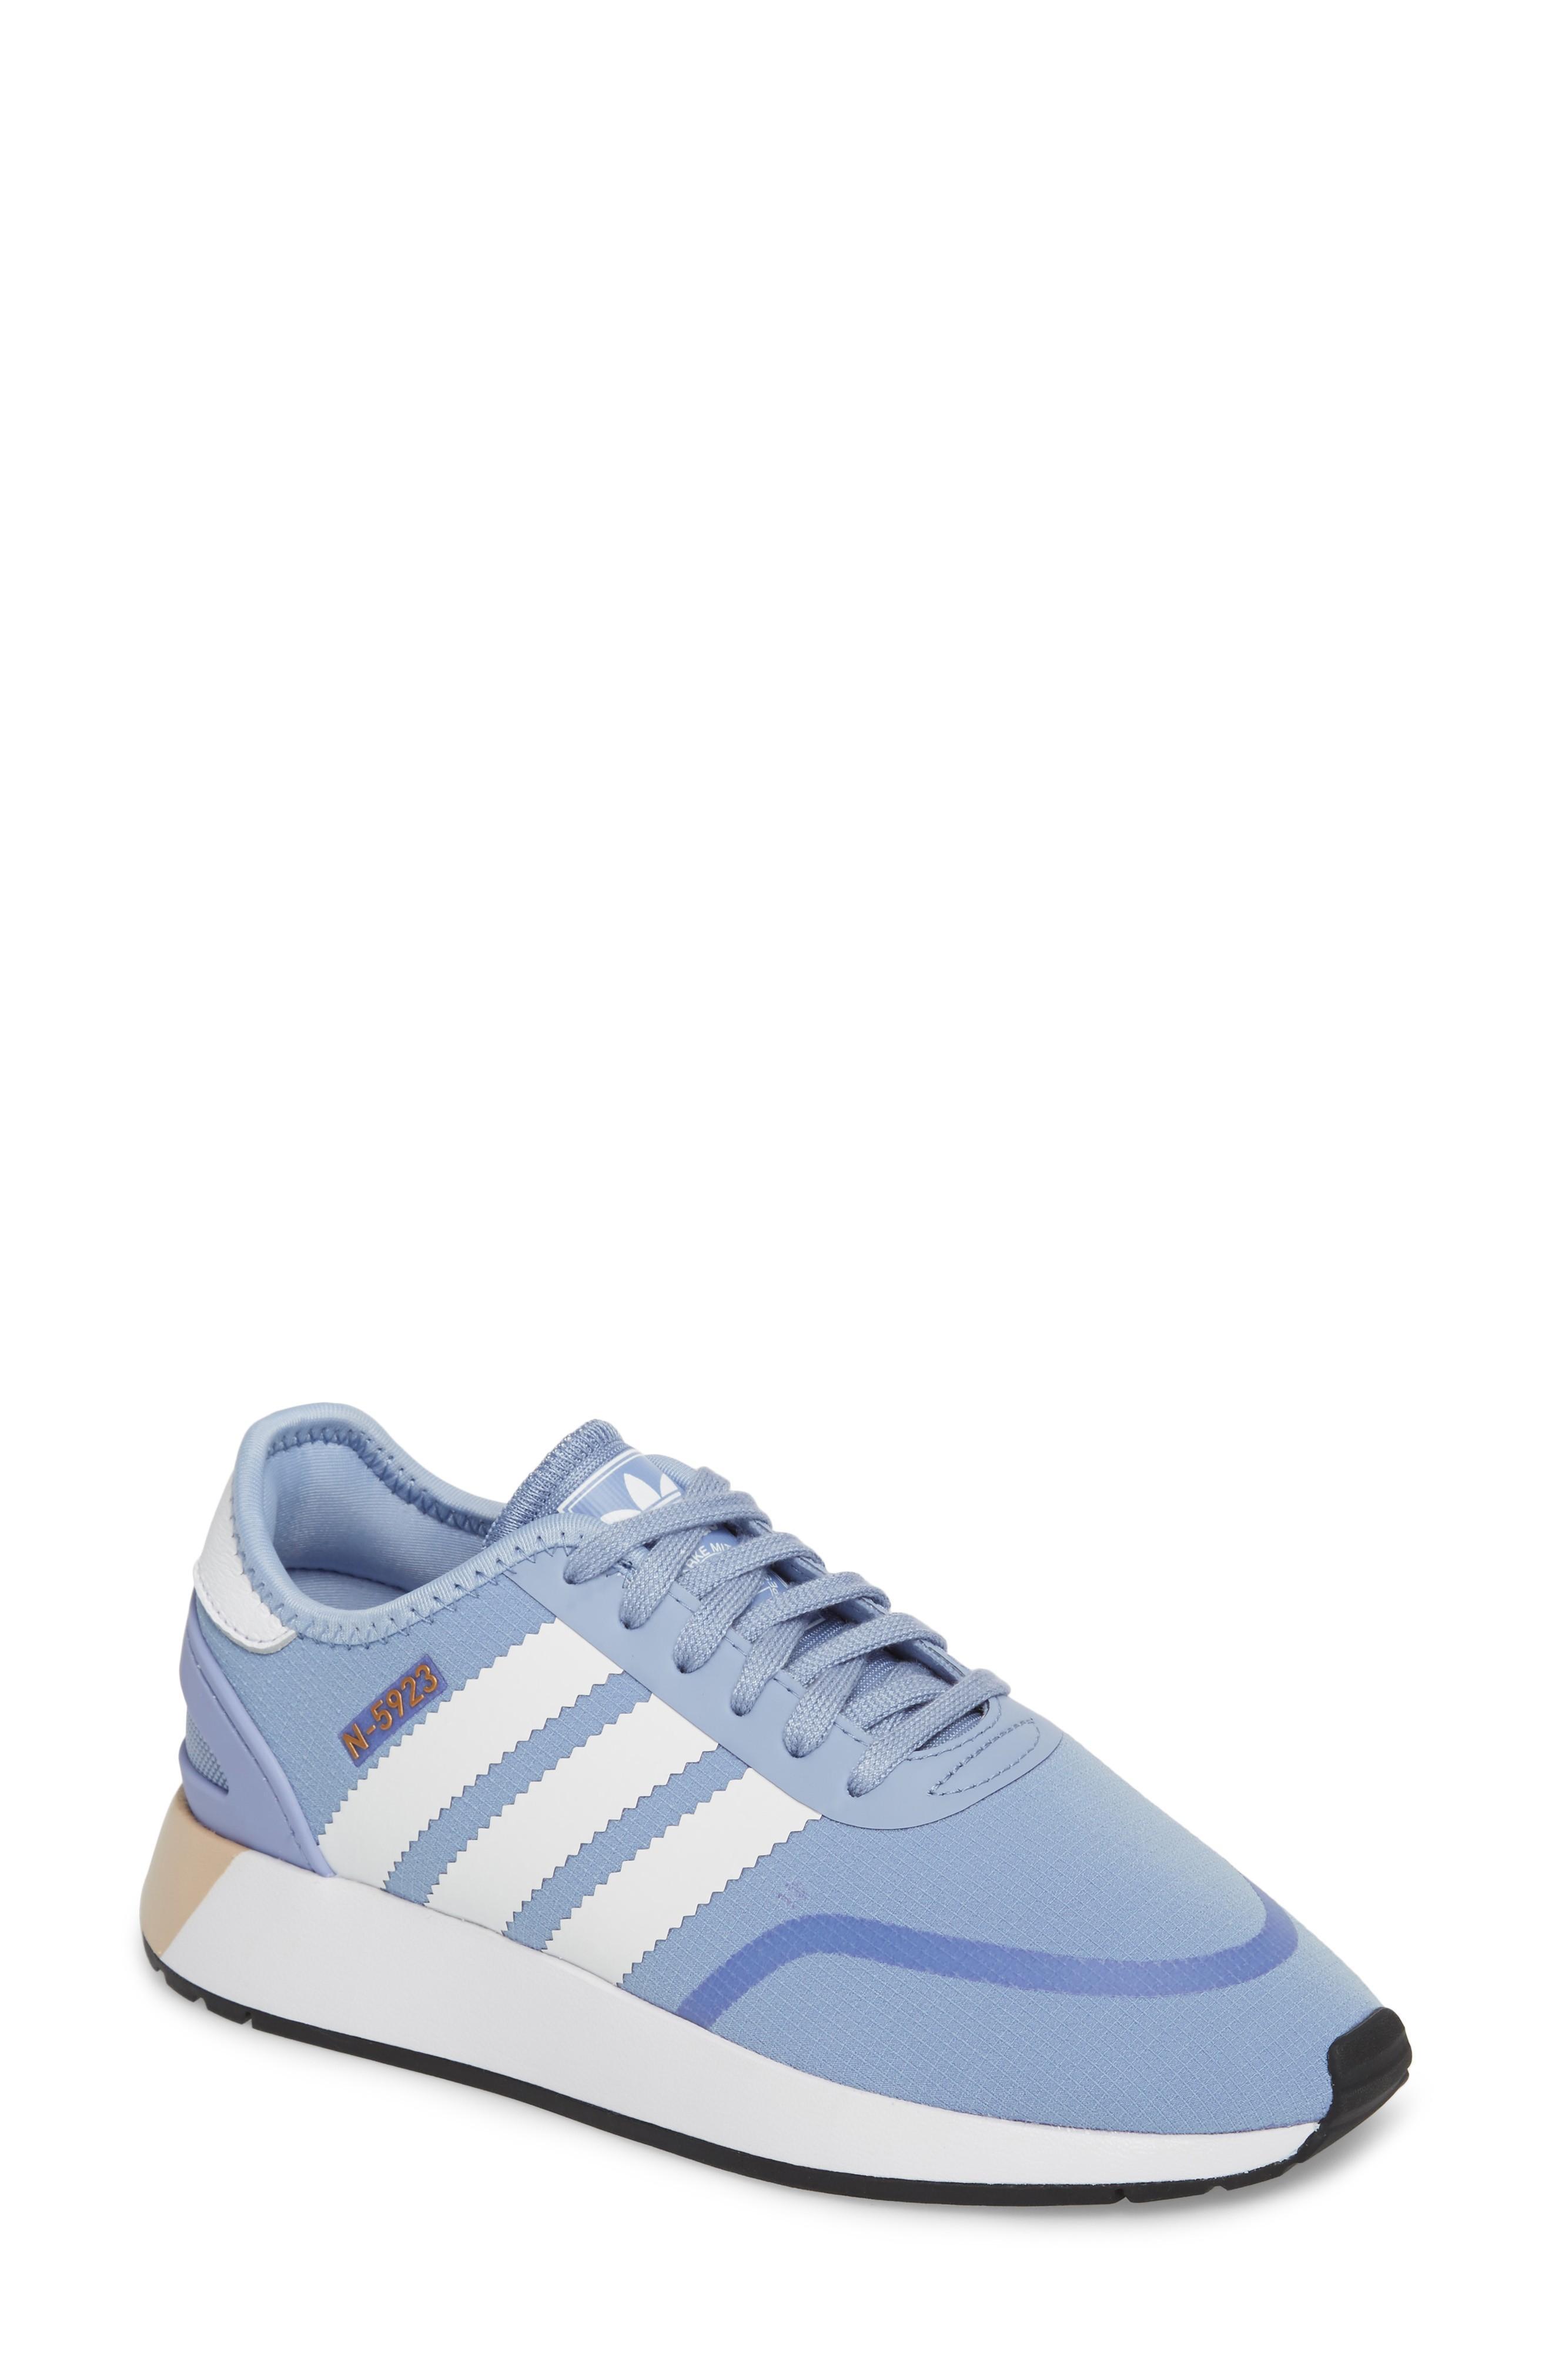 5a08ea6b442d Adidas Originals Iniki Running Shoe In Chalk Blue  White  White ...